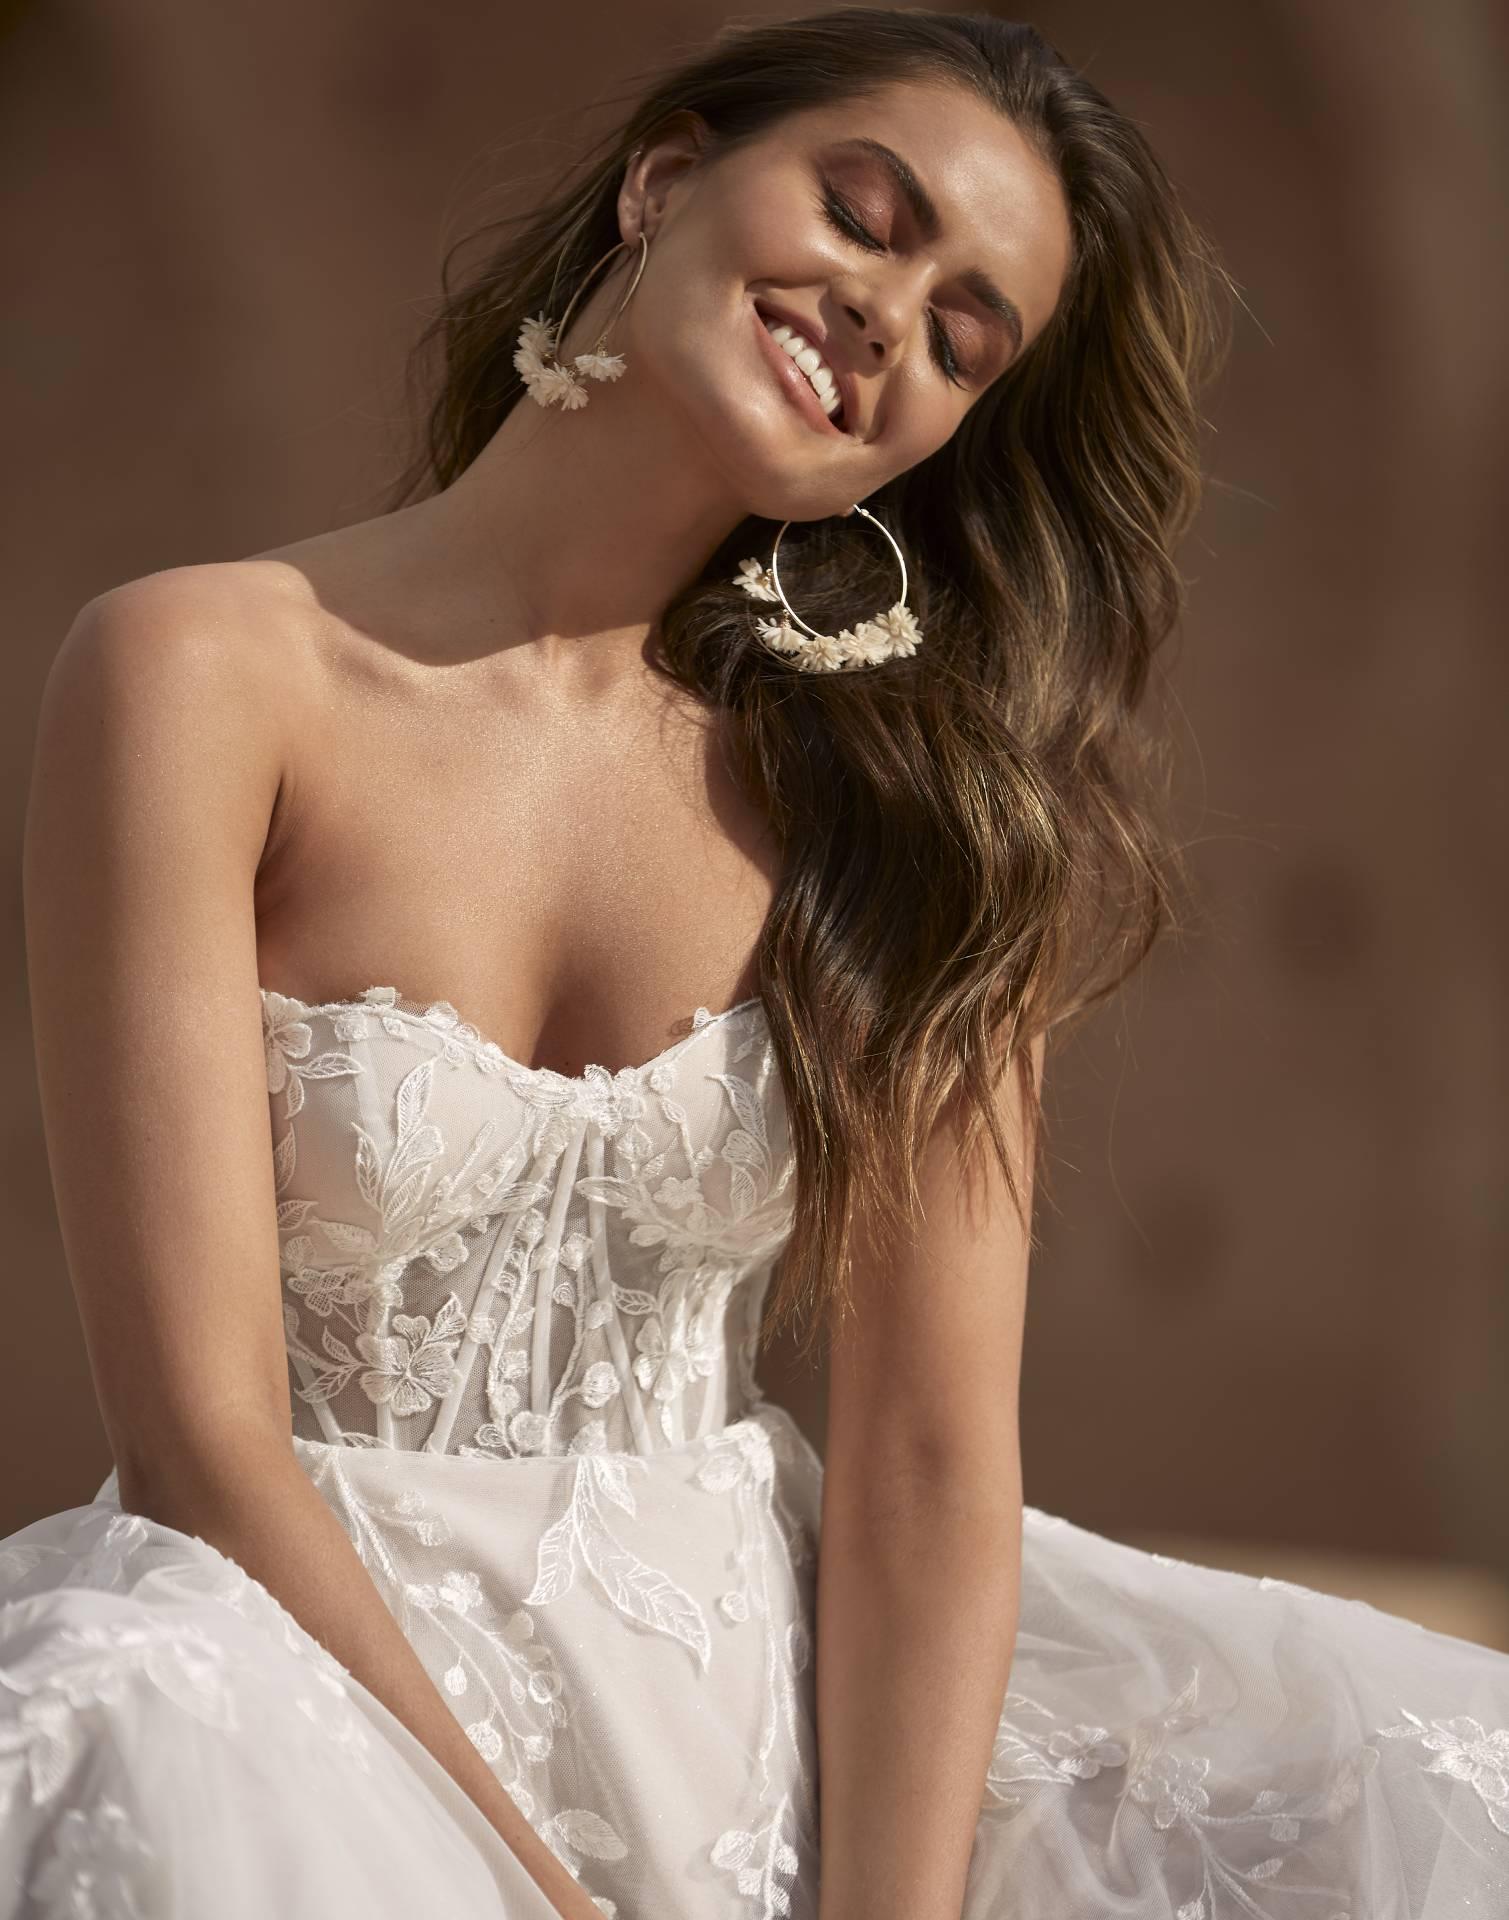 Adalyn_wedding_dress_Madi_Lane_collection_front_view-min